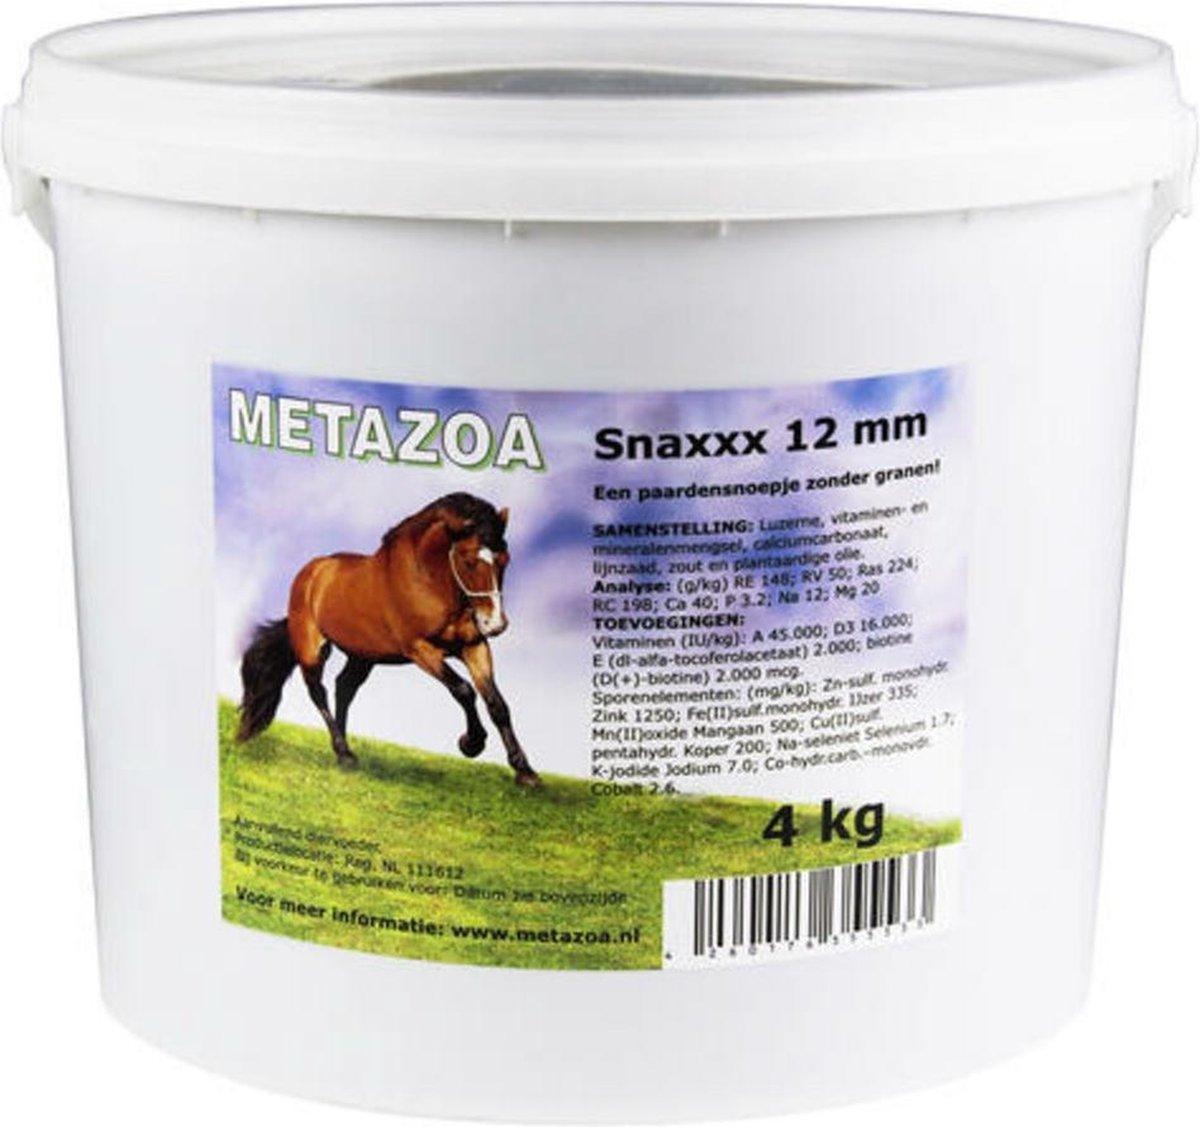 Metazoa Snaxxx Paardensnoepjes - 4 kg